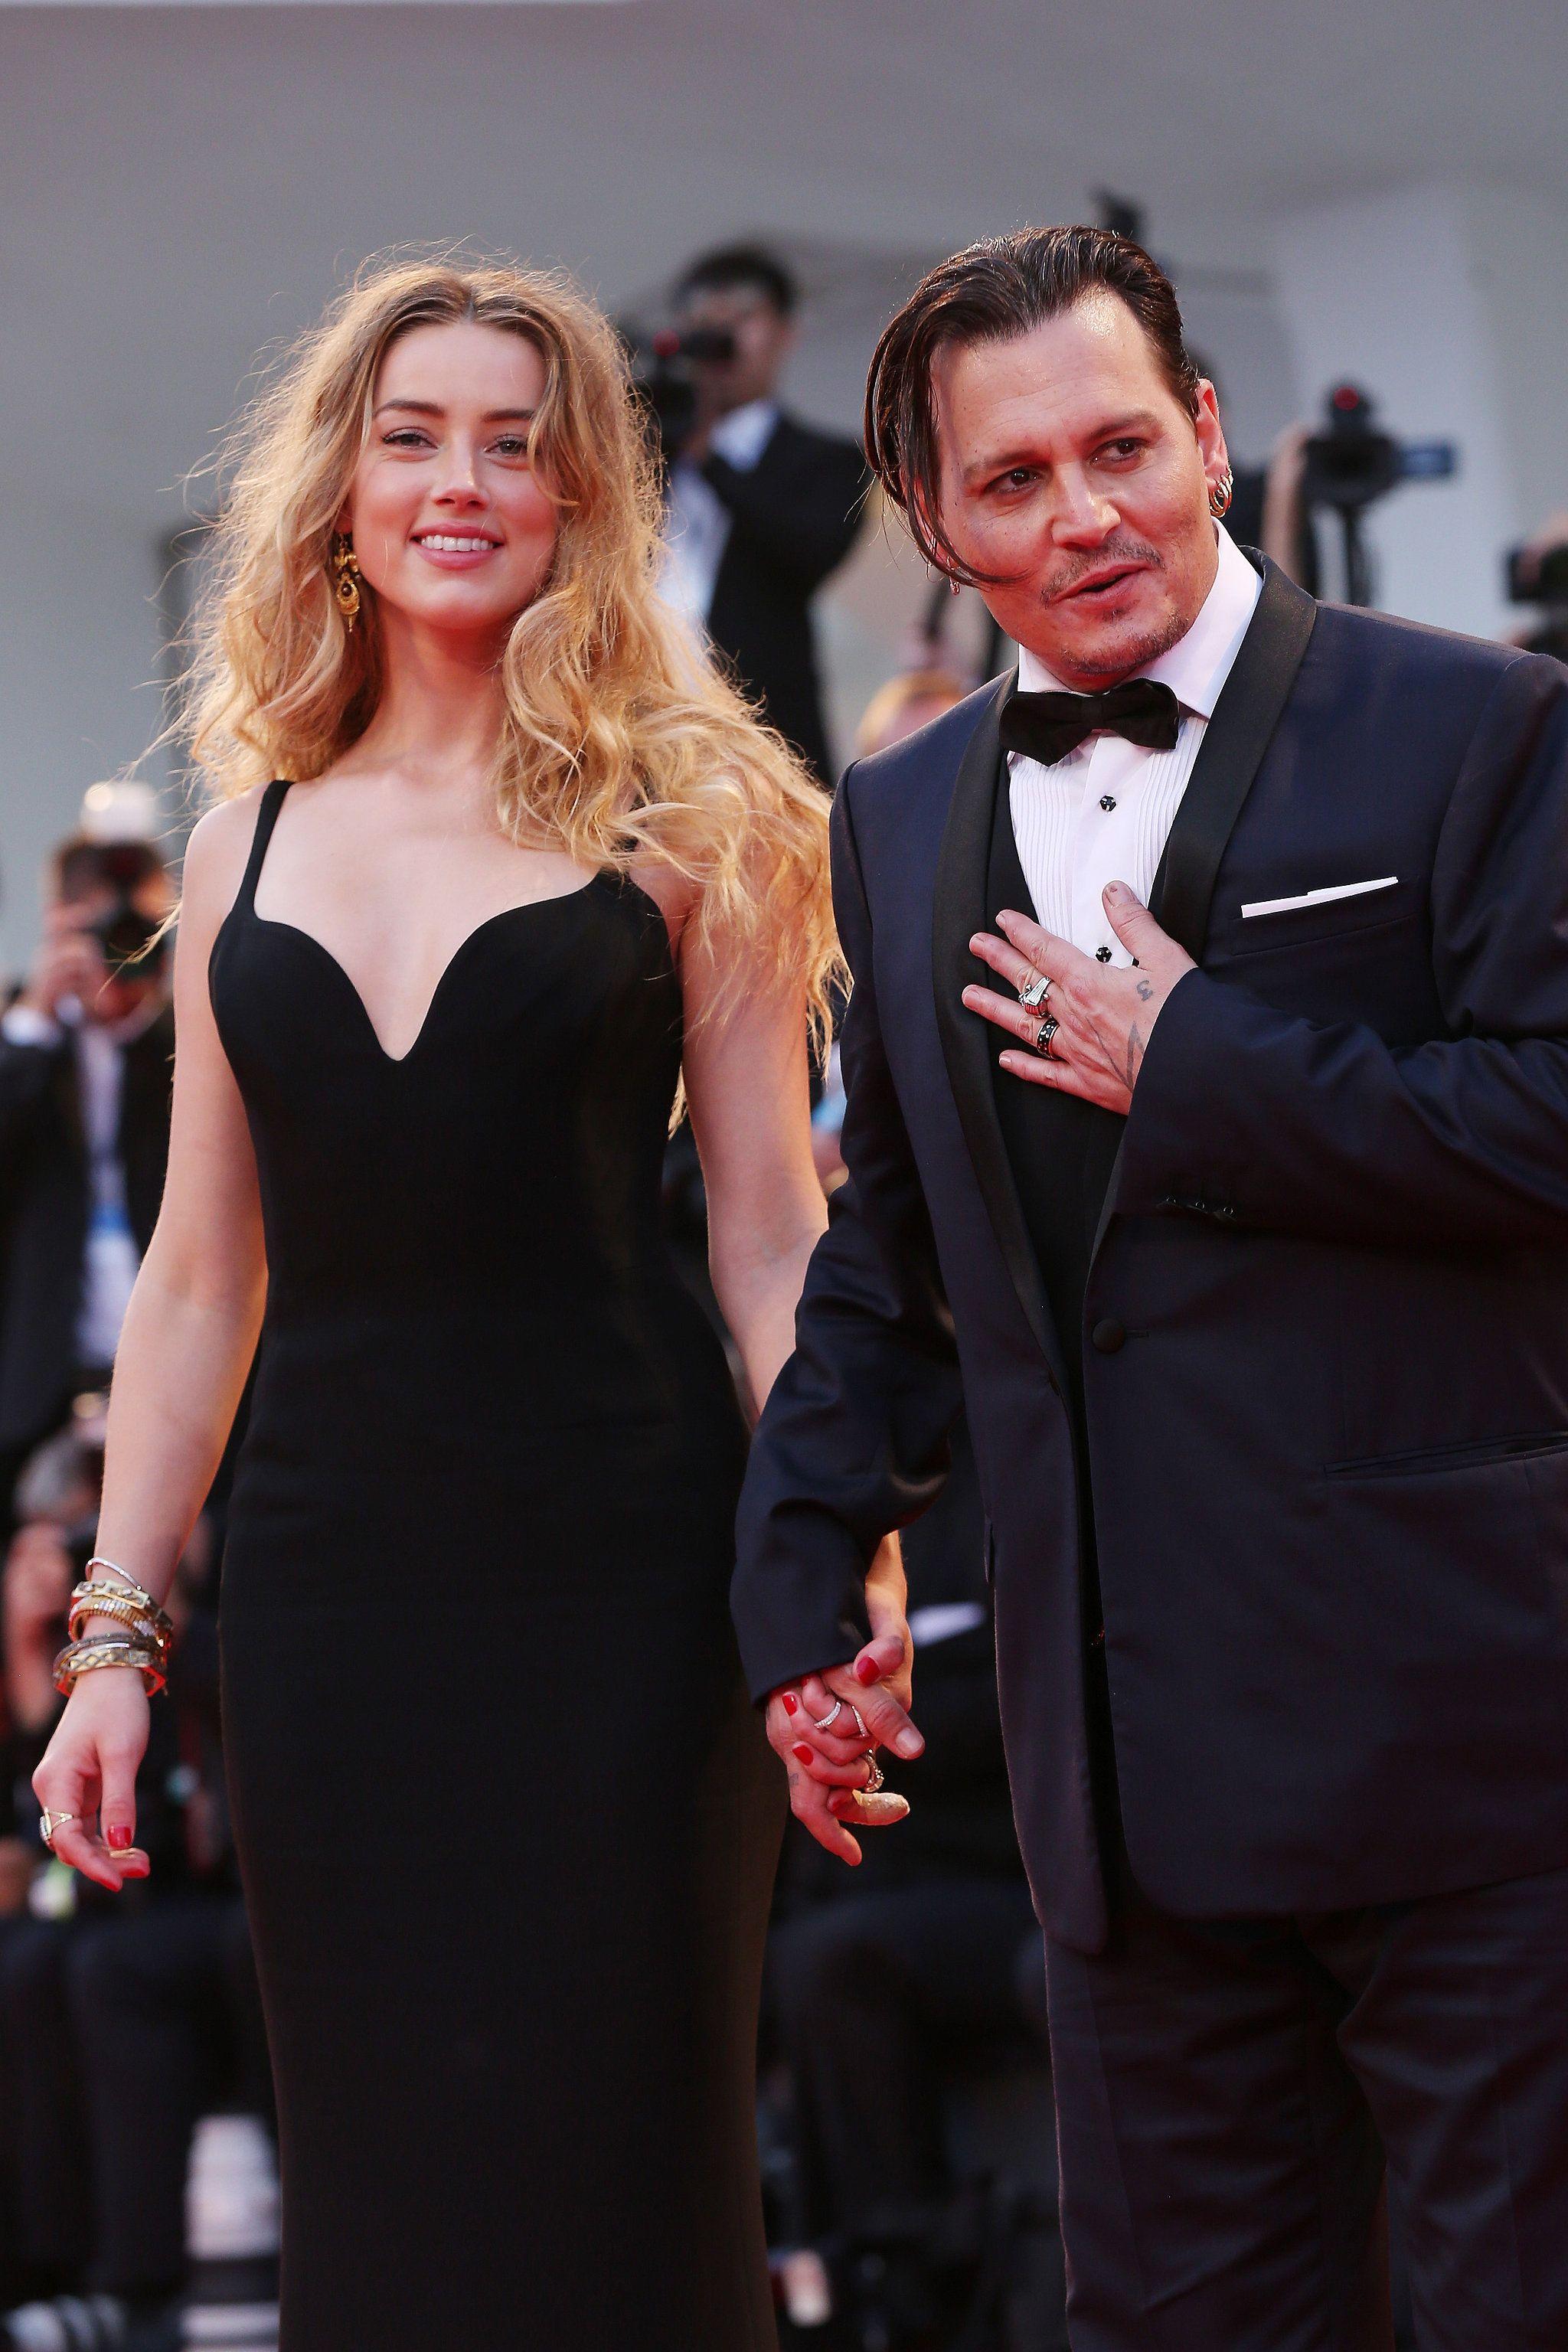 Johnny Depp And Amber Heard Share The Look Of Love On The Red Carpet Johnny Depp And Amber Johnny Depp Amber Heard